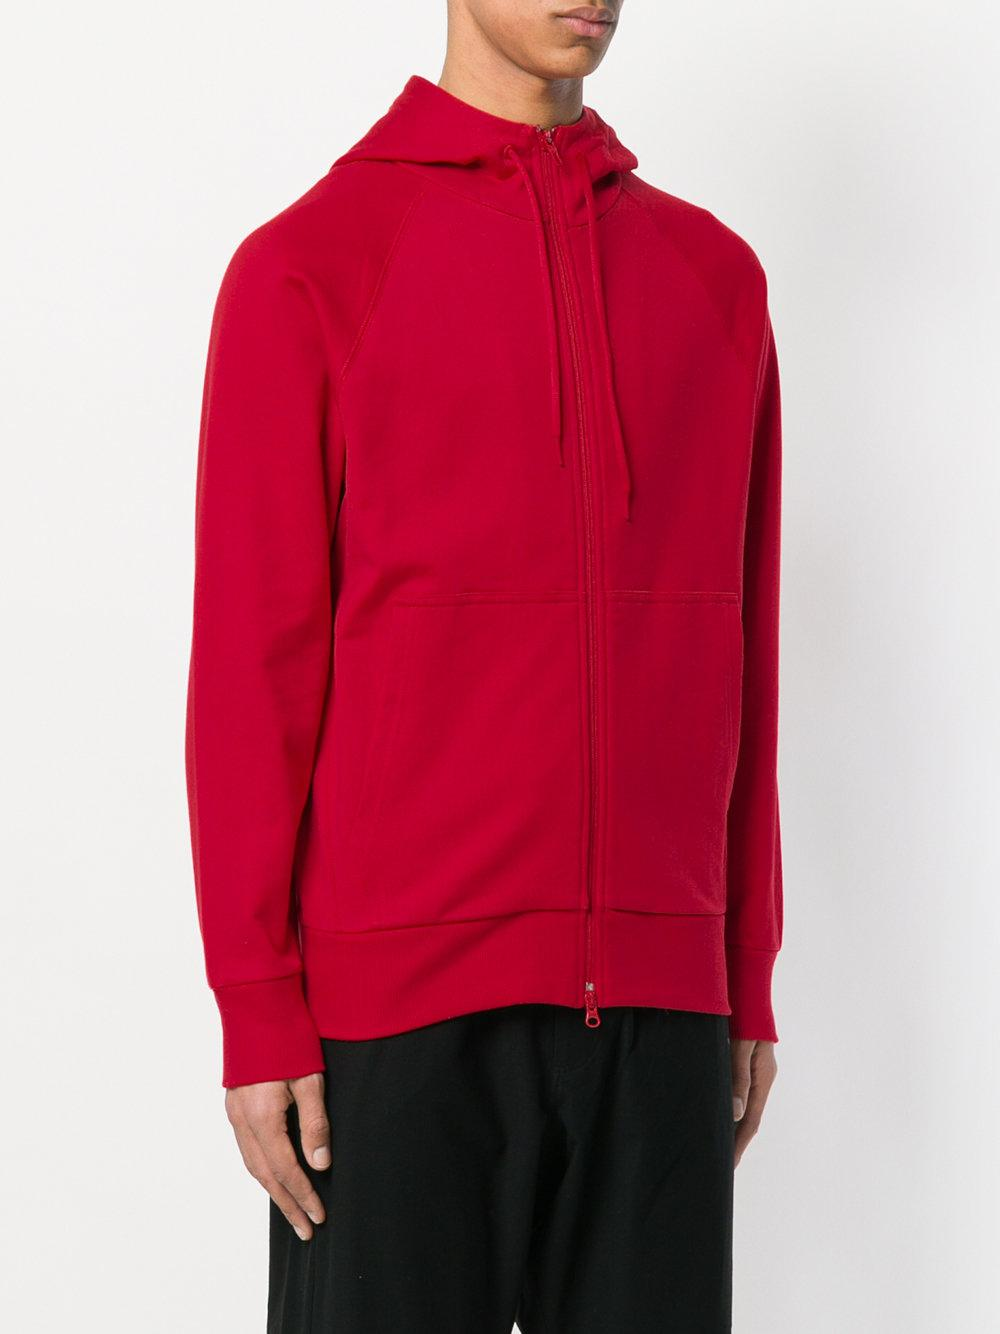 Y-3 Cotton Zip-up Hoodie in Red for Men